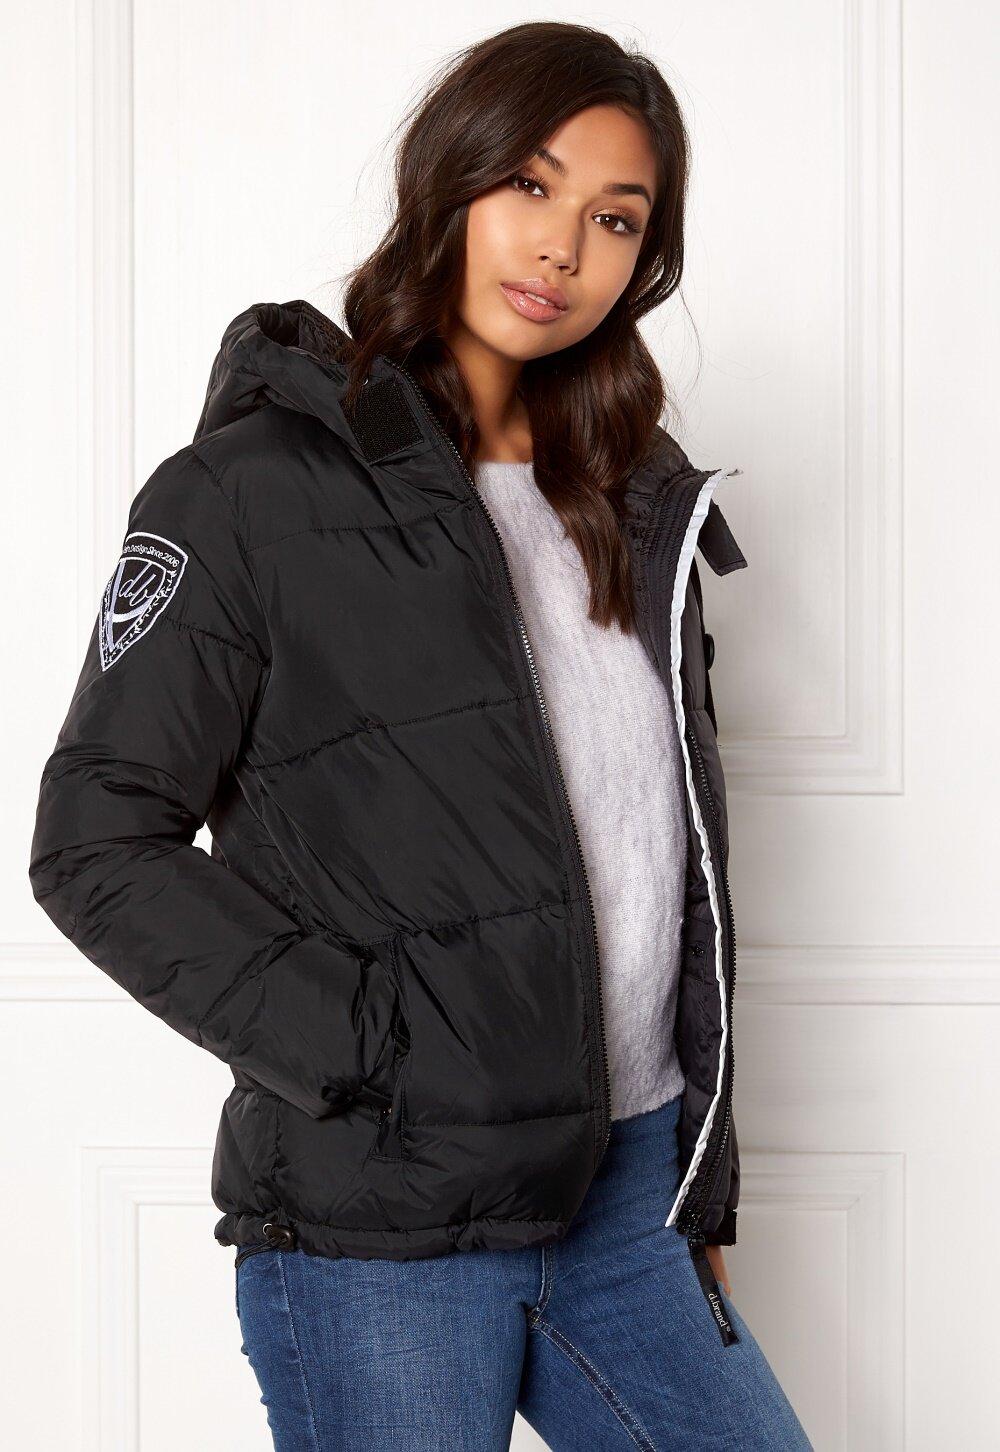 D.Brand Eskimå Jacket Black/Black